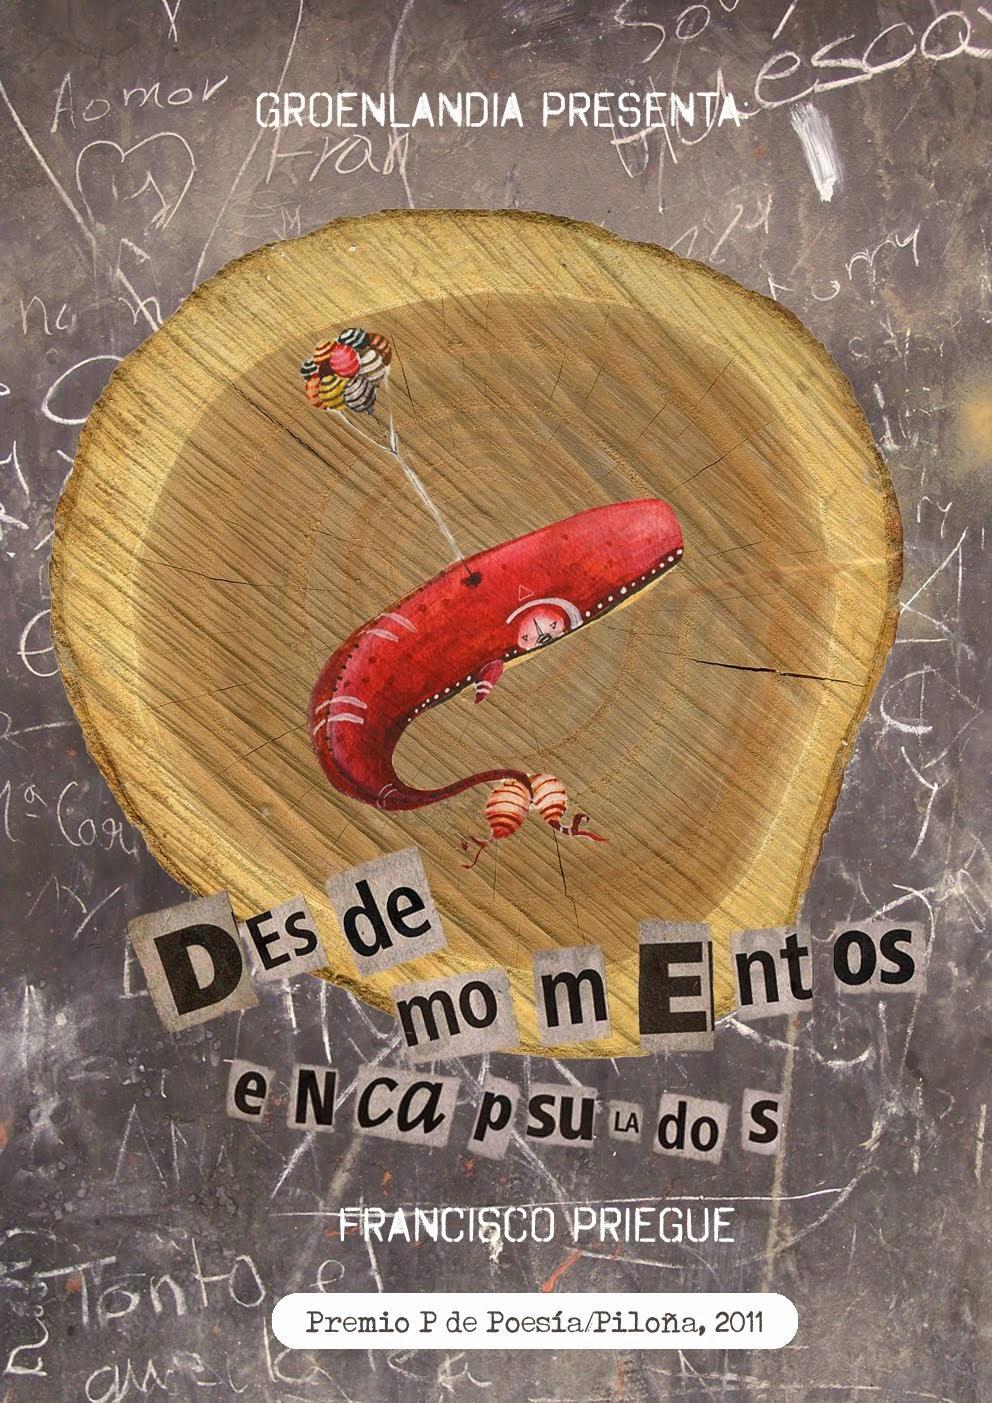 """DESDE MOMENTOS ENCAPSULADOS"" (Groenlandia, 2013)"